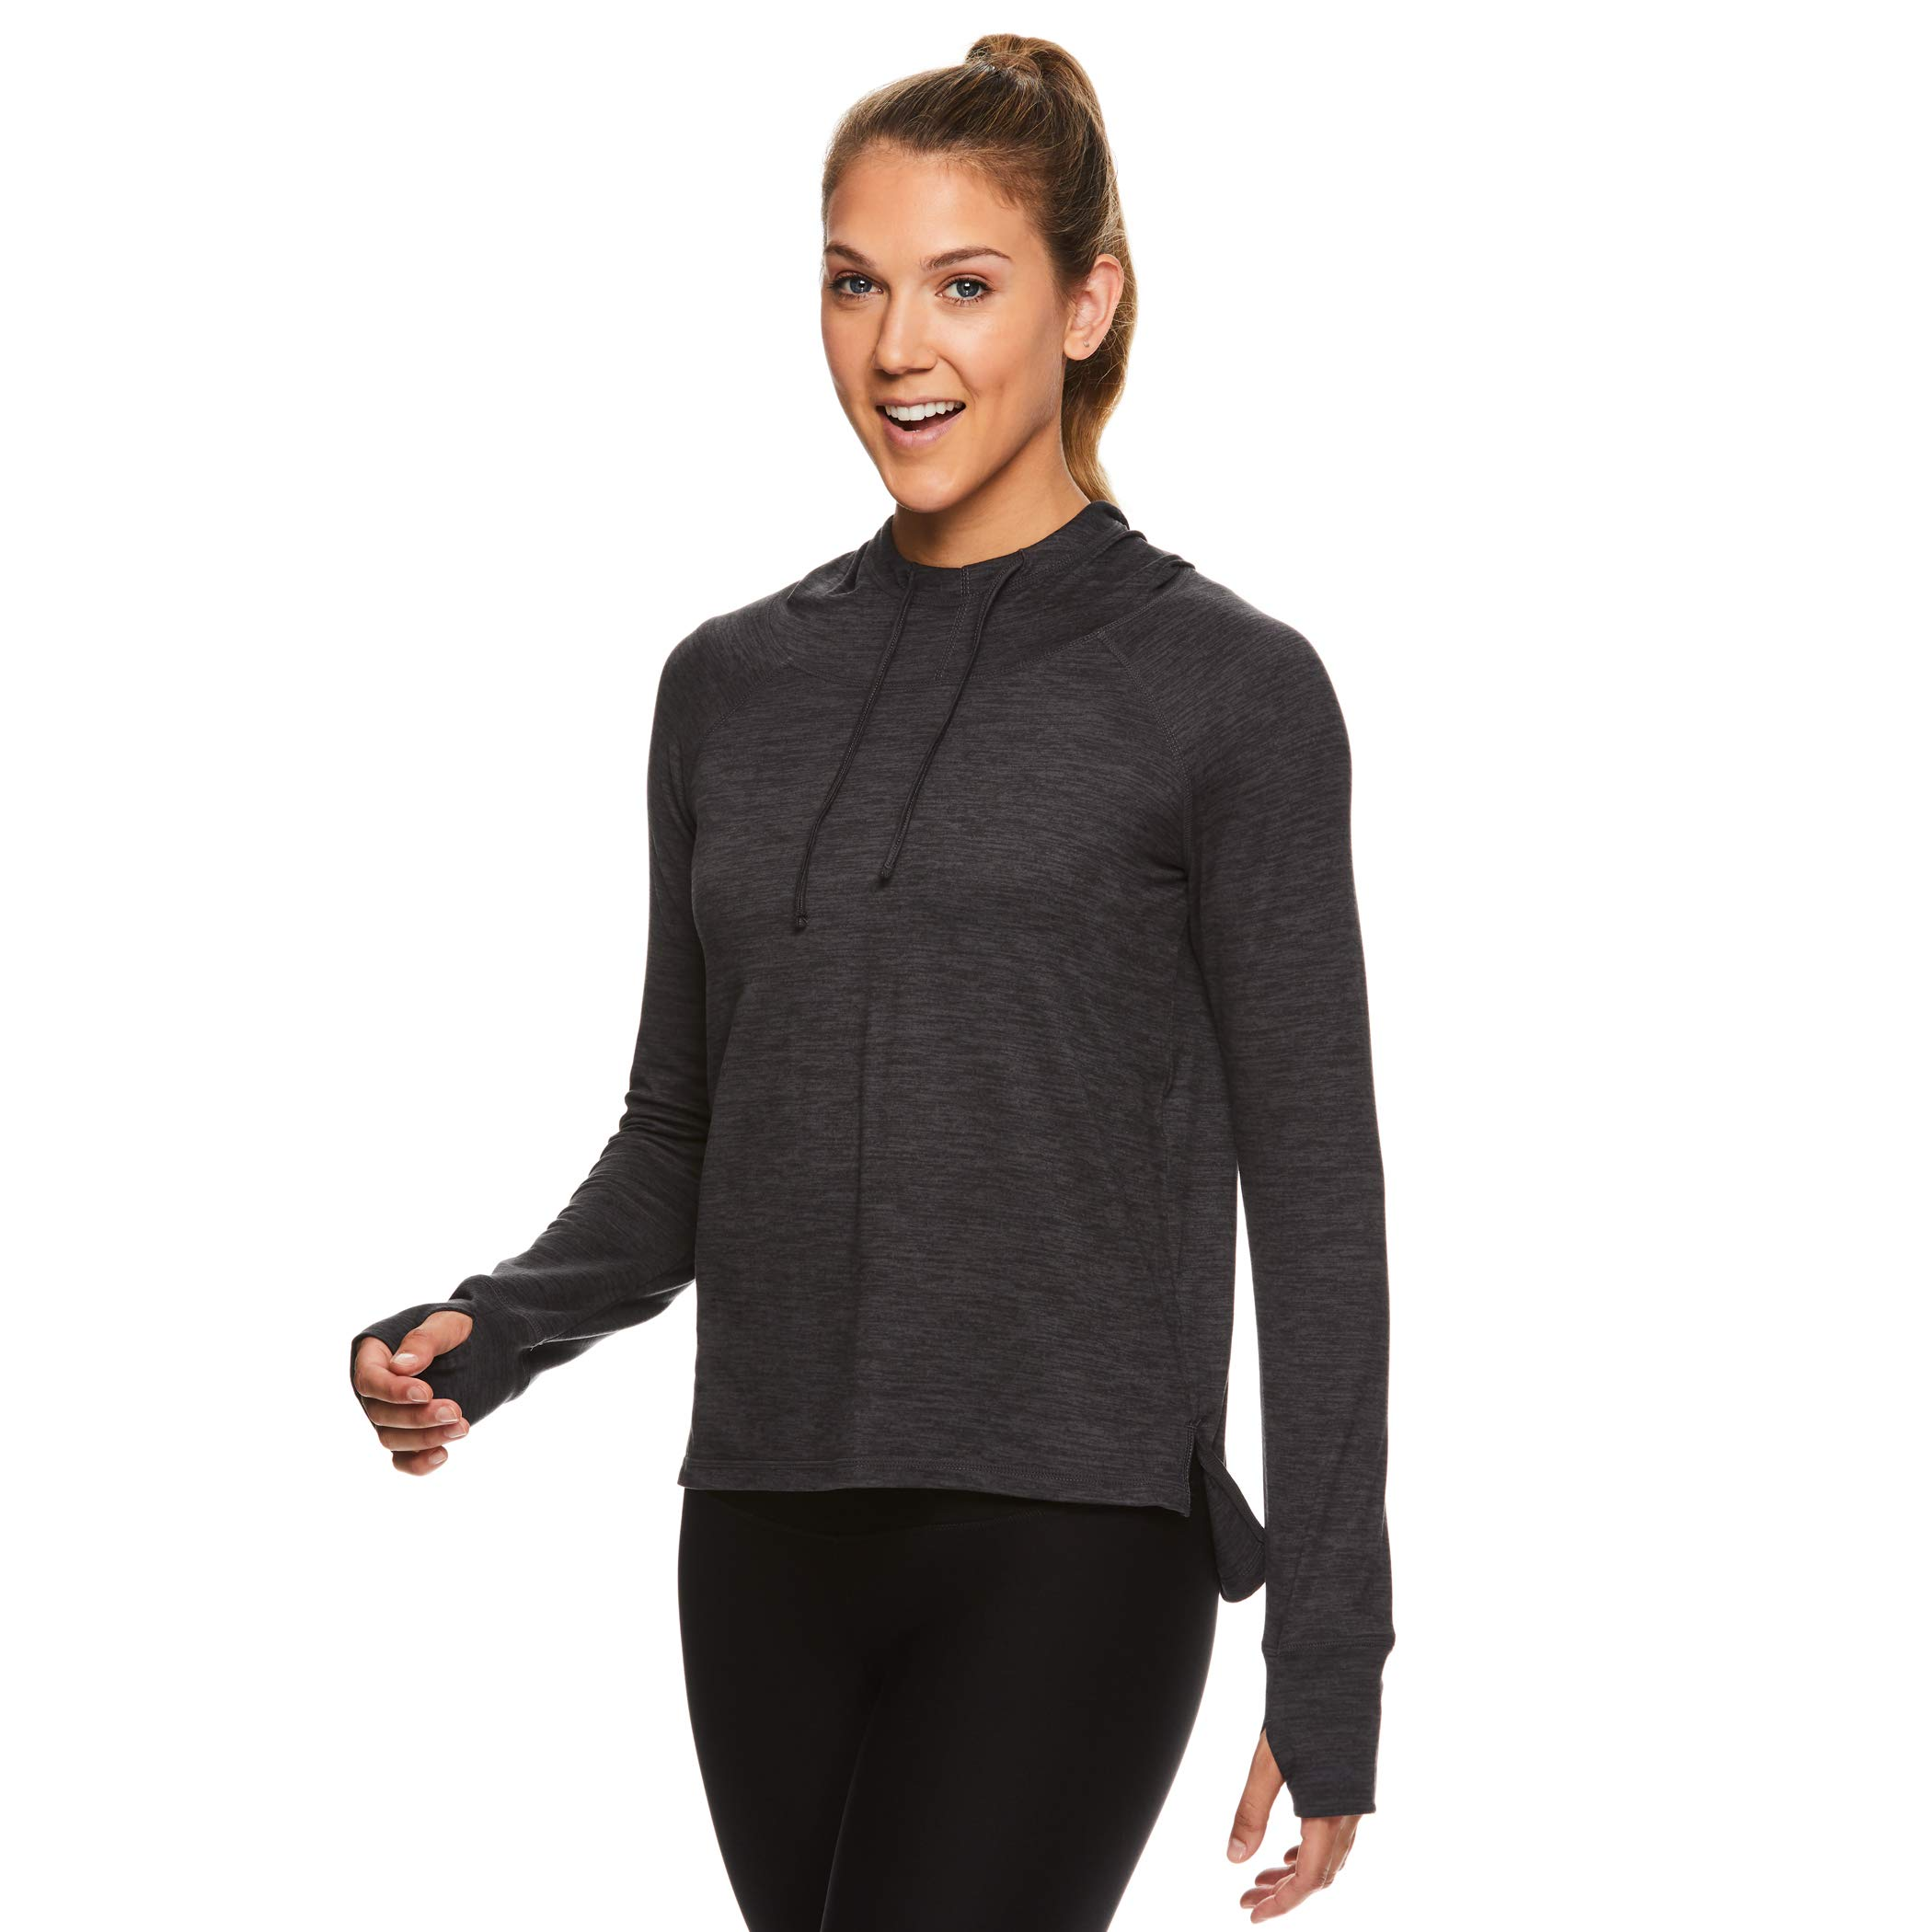 Gaiam Women's Pullover Hoodie Yoga Sweatshirt - Lightweight Long Sleeve Athleisure Sweater - Maya Gaiam Solid Asphalt Heather, X-Large by Gaiam